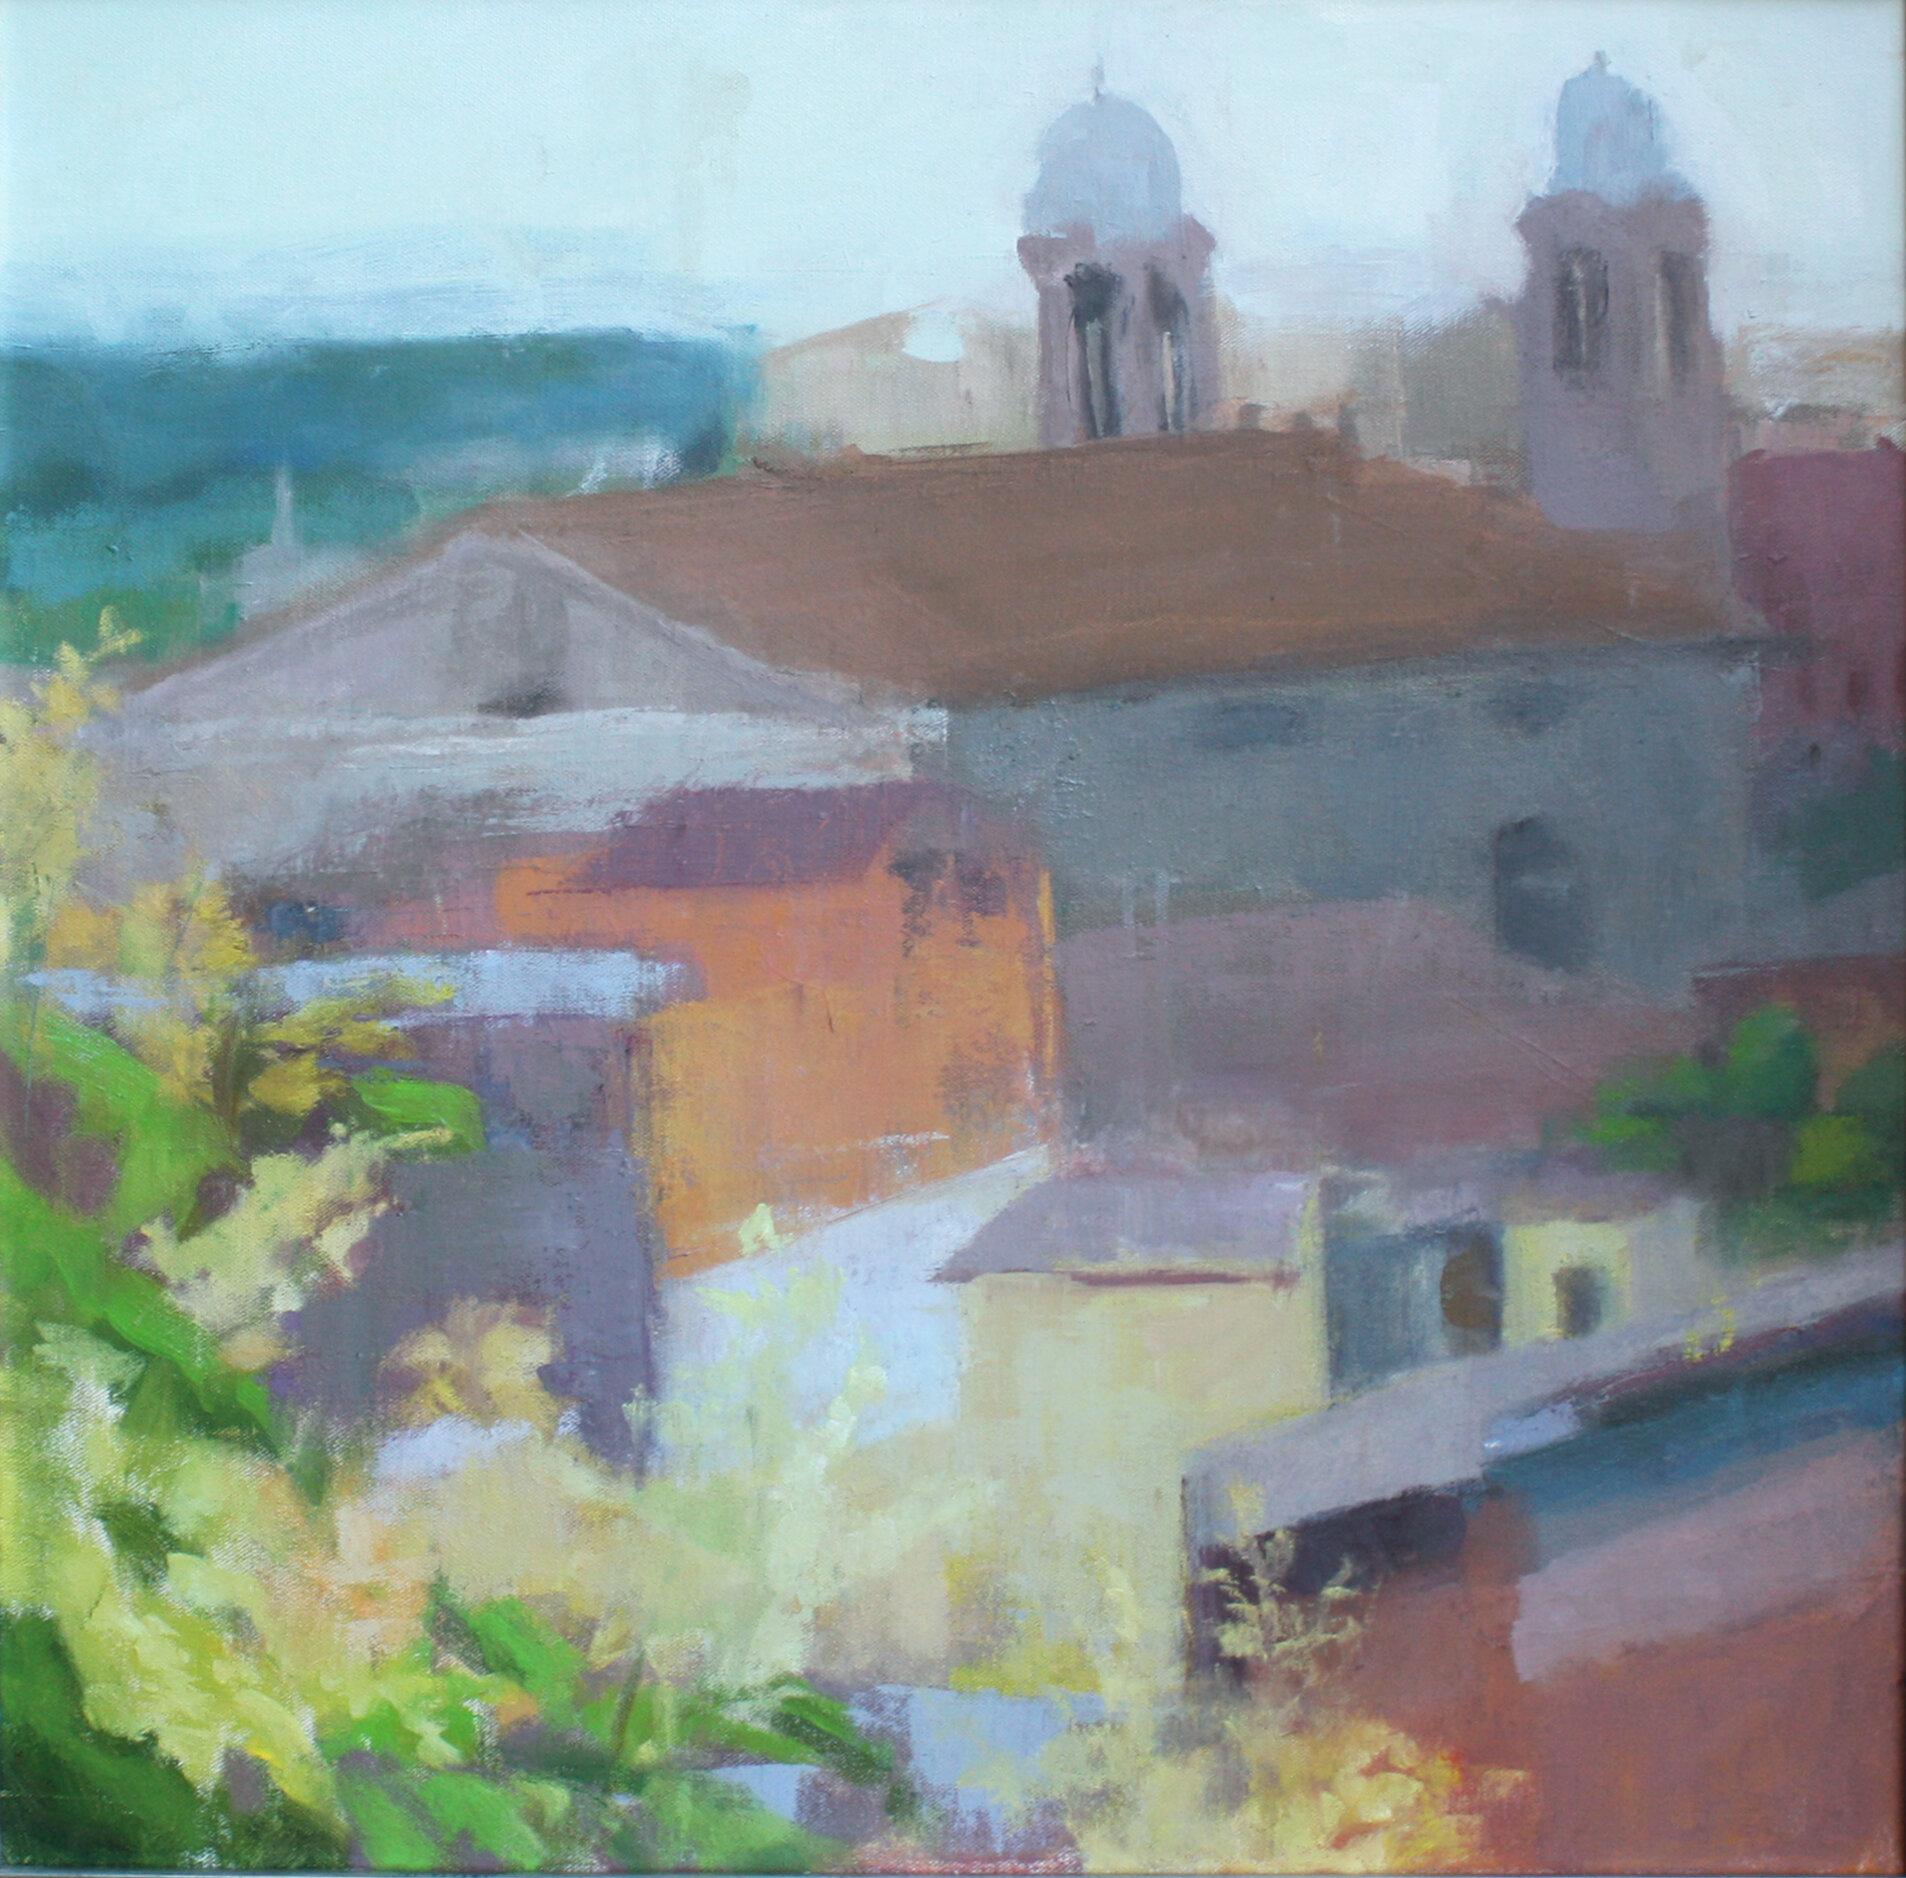 Tutt i, oil on canvas, 24 by 24 inches    Caroline Chen